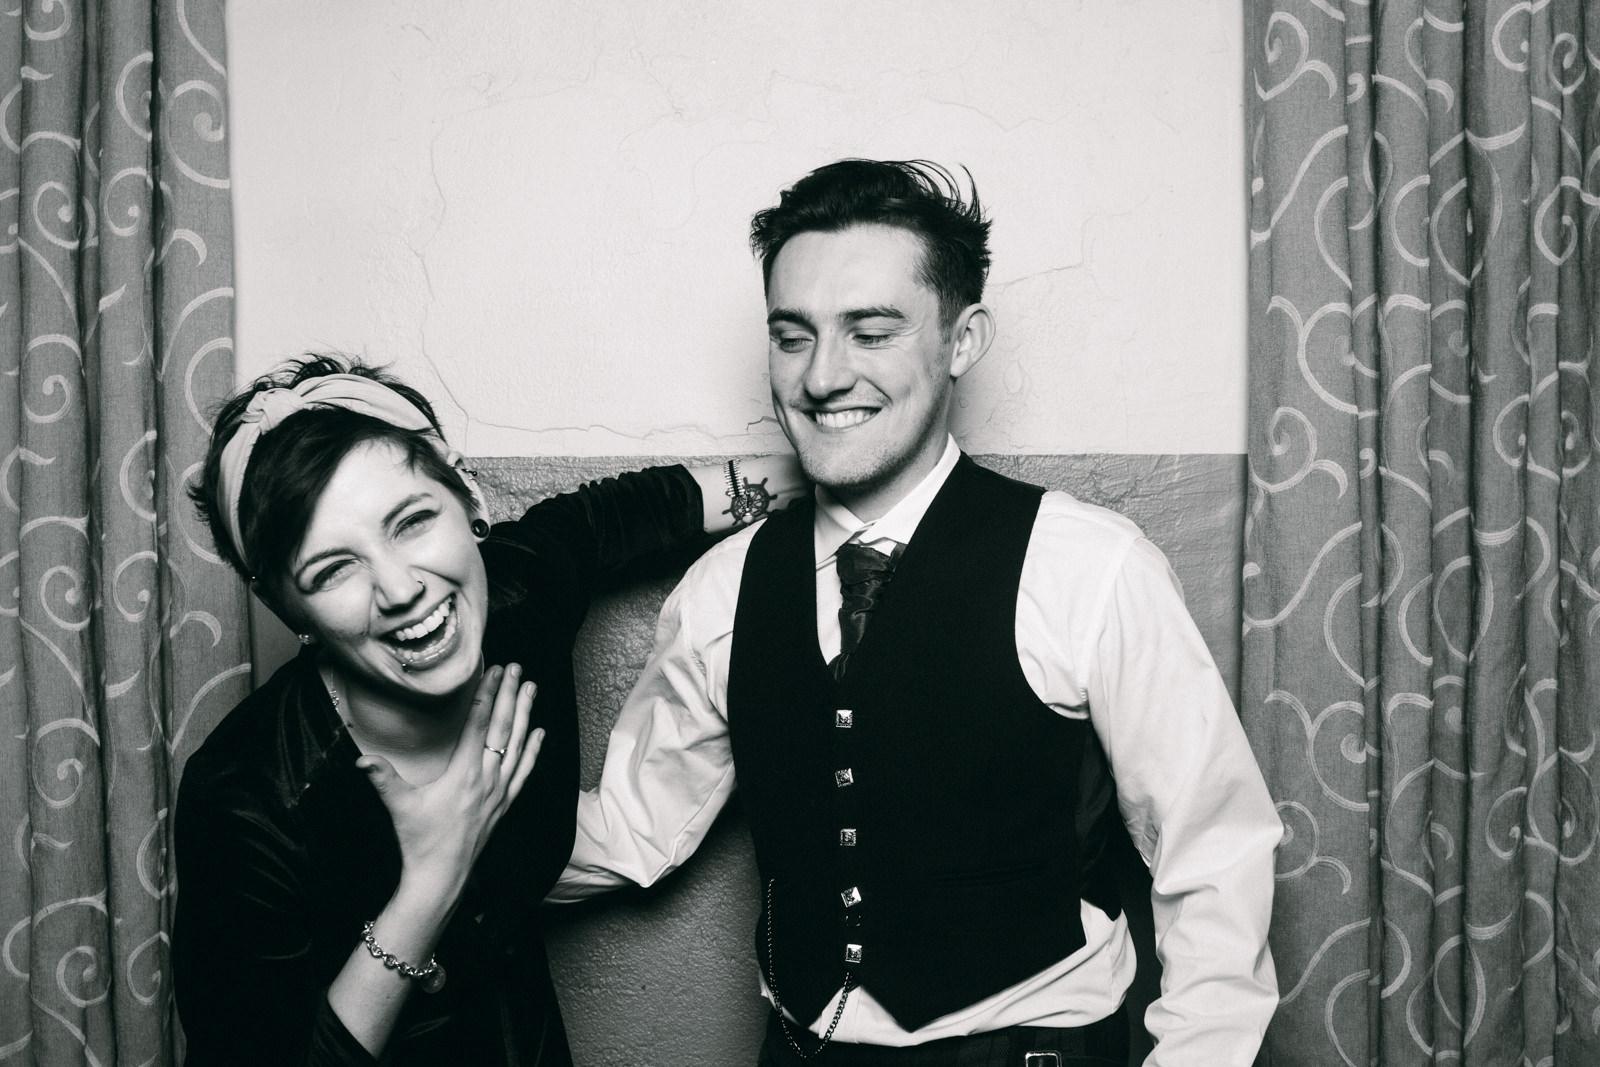 Tara-Dan-Wedding-Photo-Booth-Allentown-Brew-Works-24.jpg